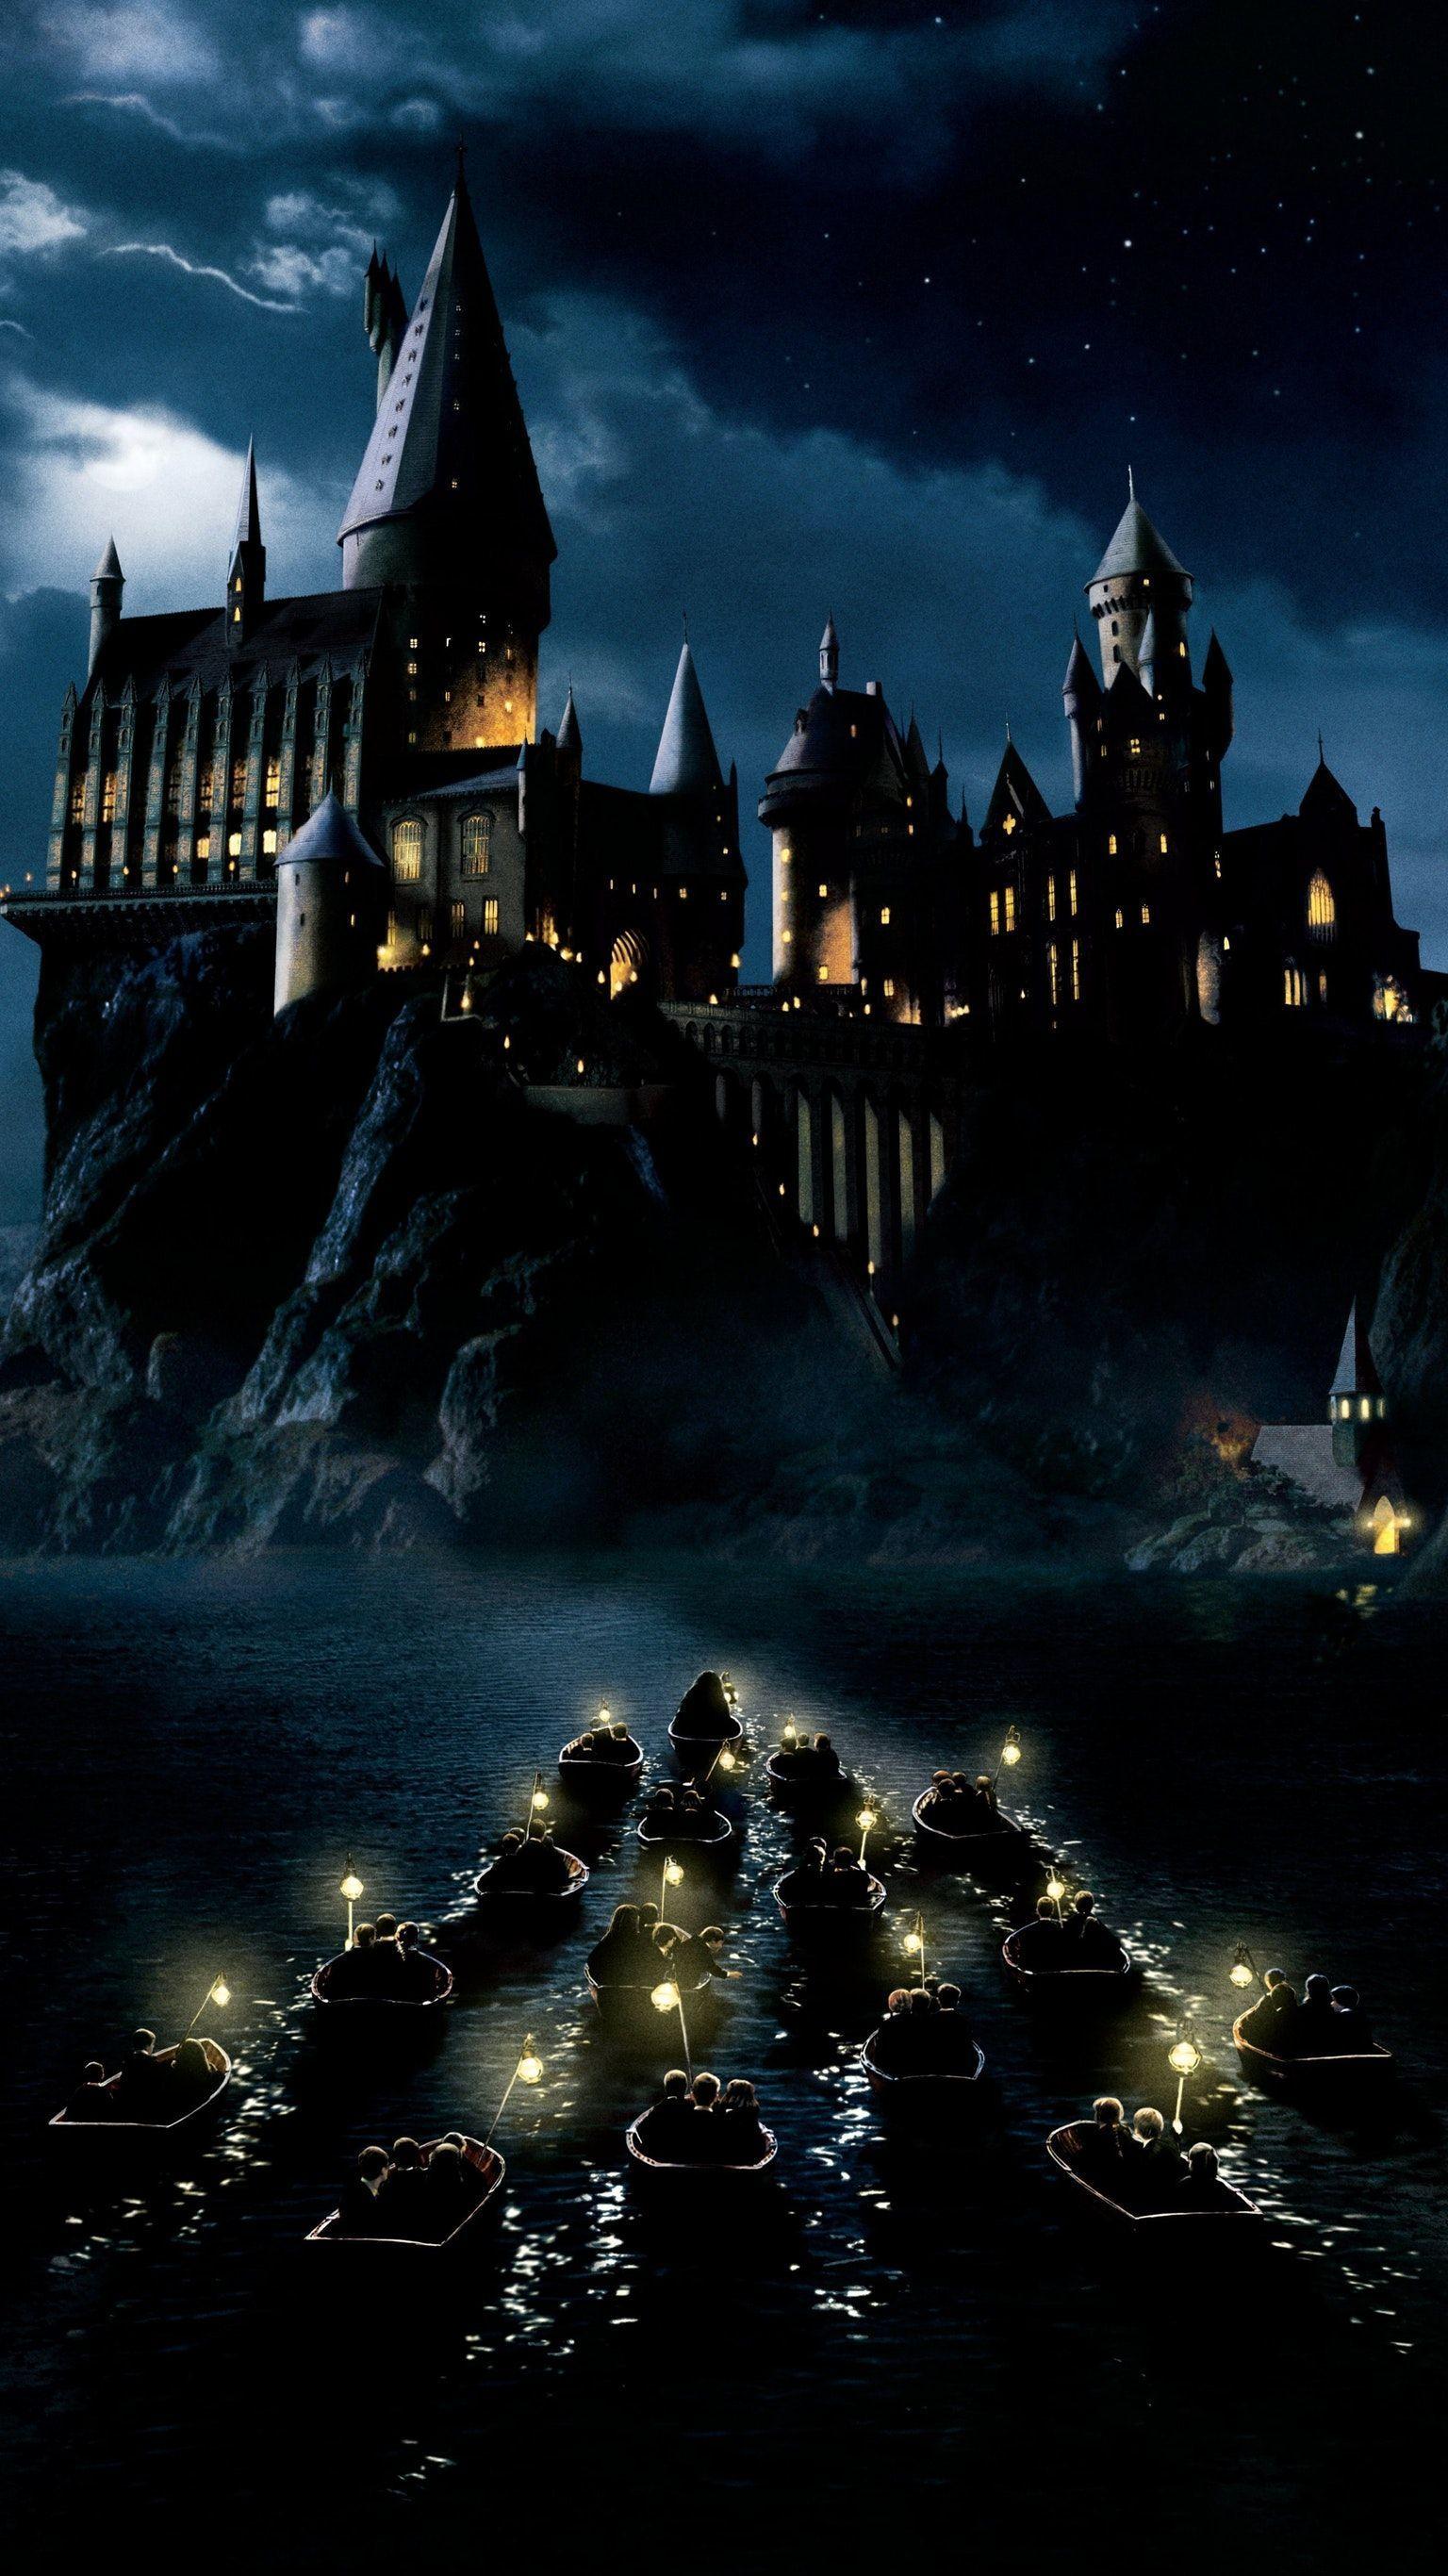 Harry Potter Hogwarts Iphone Wallpapers Top Free Harry Potter Hogwarts Iphone Backgrounds Wallpaperaccess Harry Potter Aesthetic Latar Belakang Pemandangan